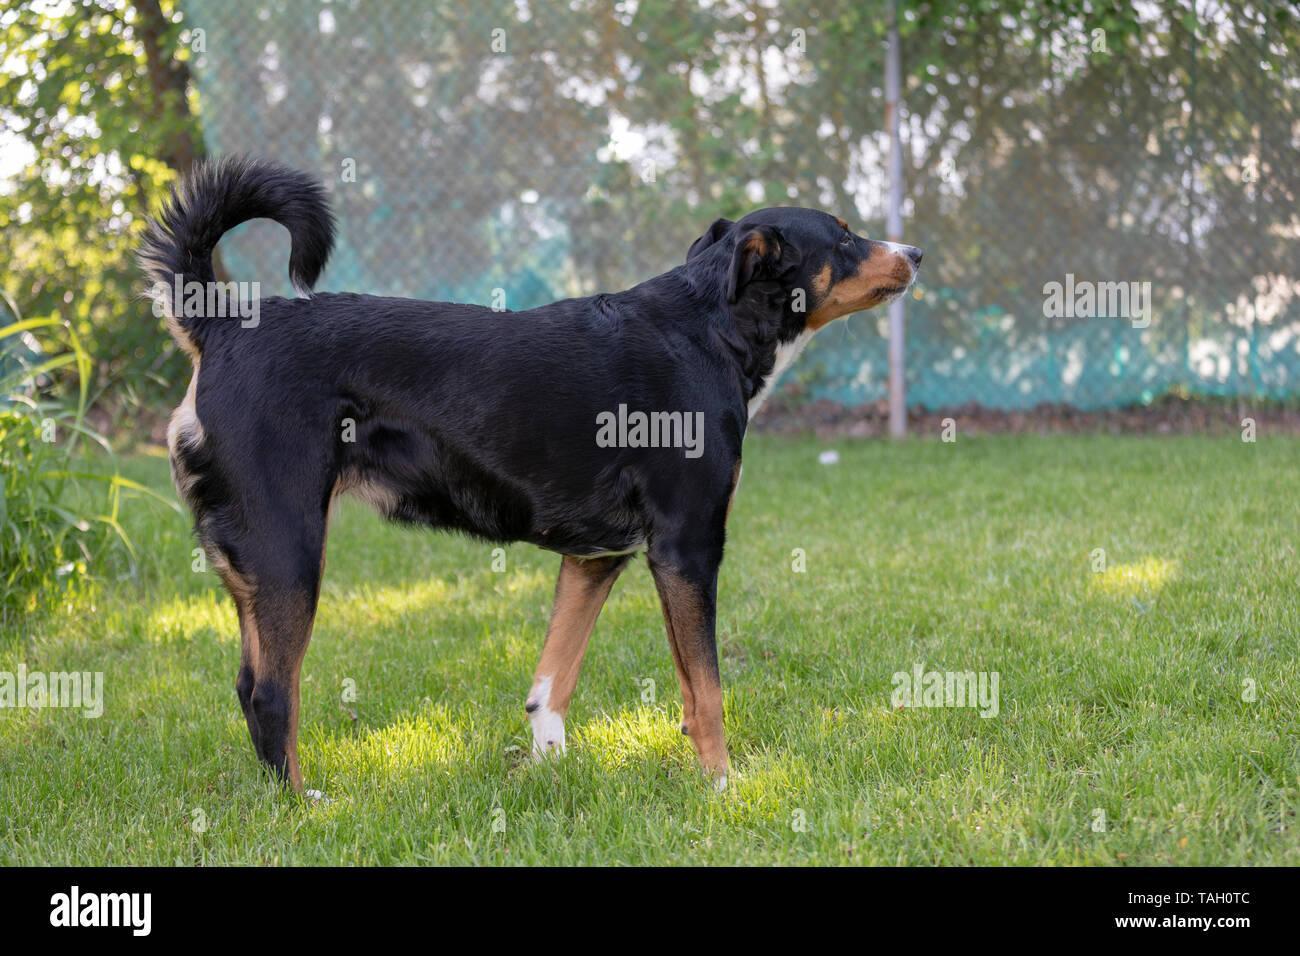 tricolor appenzeller mountain dog Barking Outdoor - Stock Image